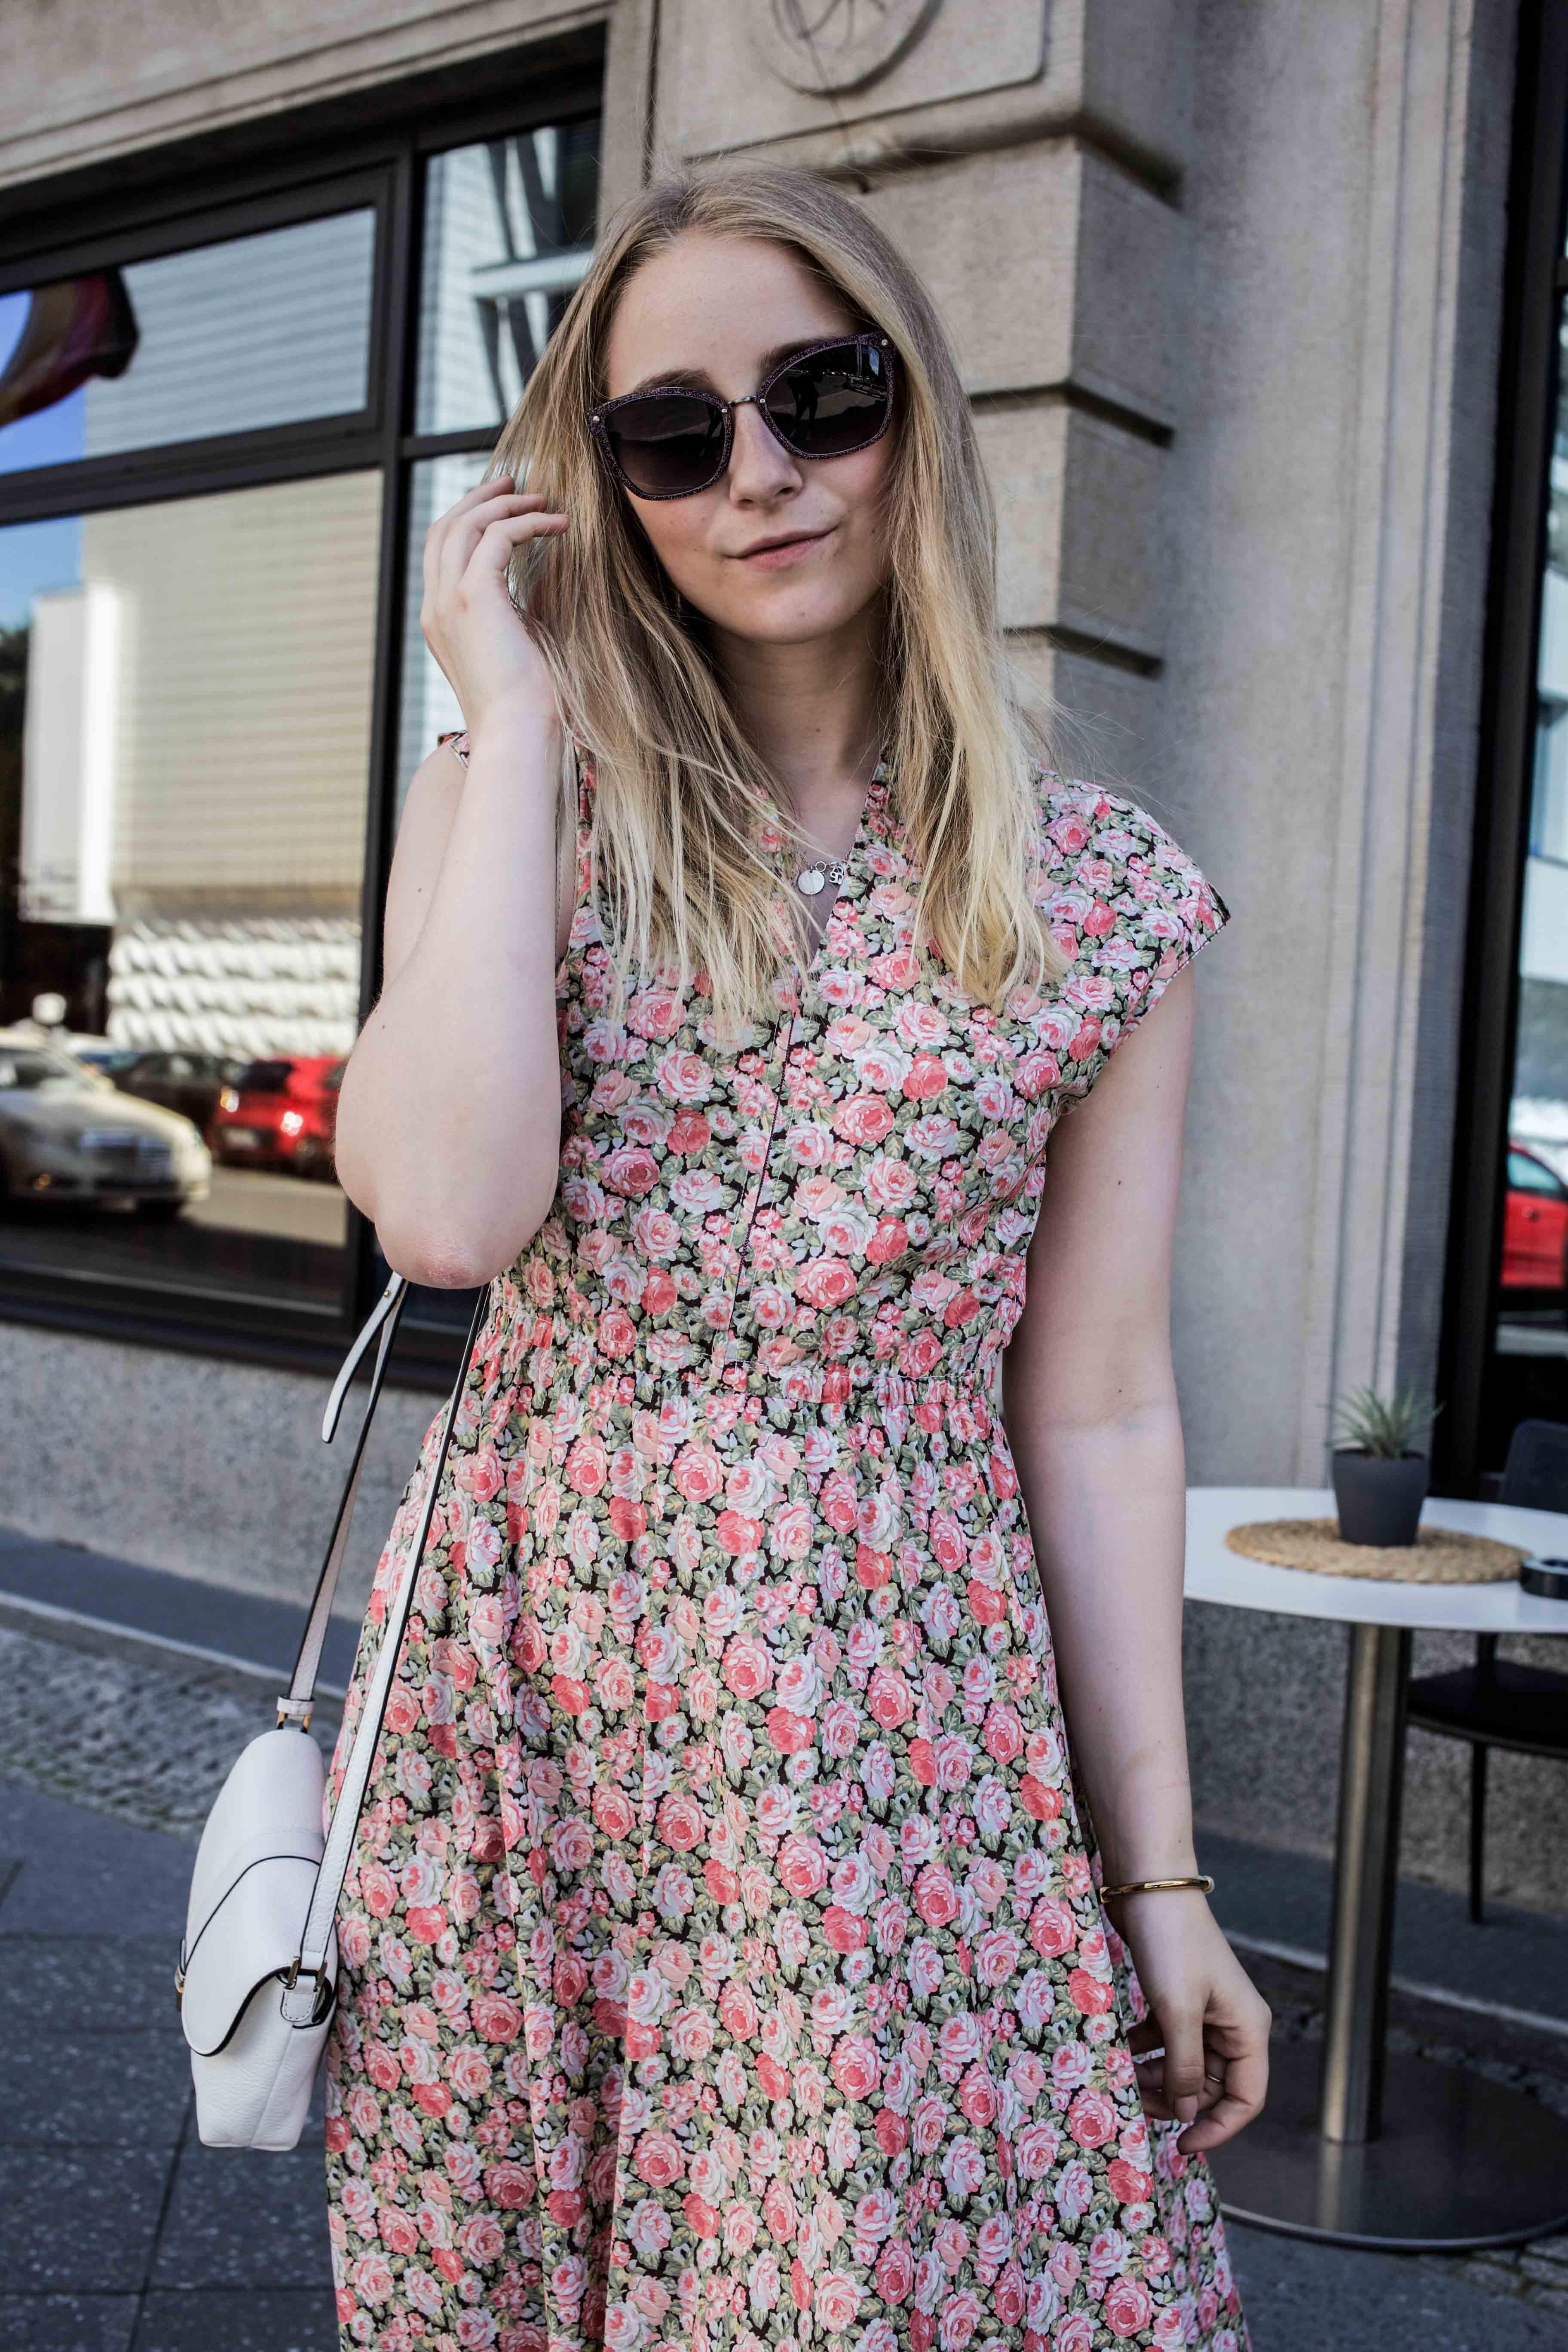 80er-jahre-blumenkleid-paris-vintage-lover-second-hand-outfit-look-fashionblogger-modeblog_7773